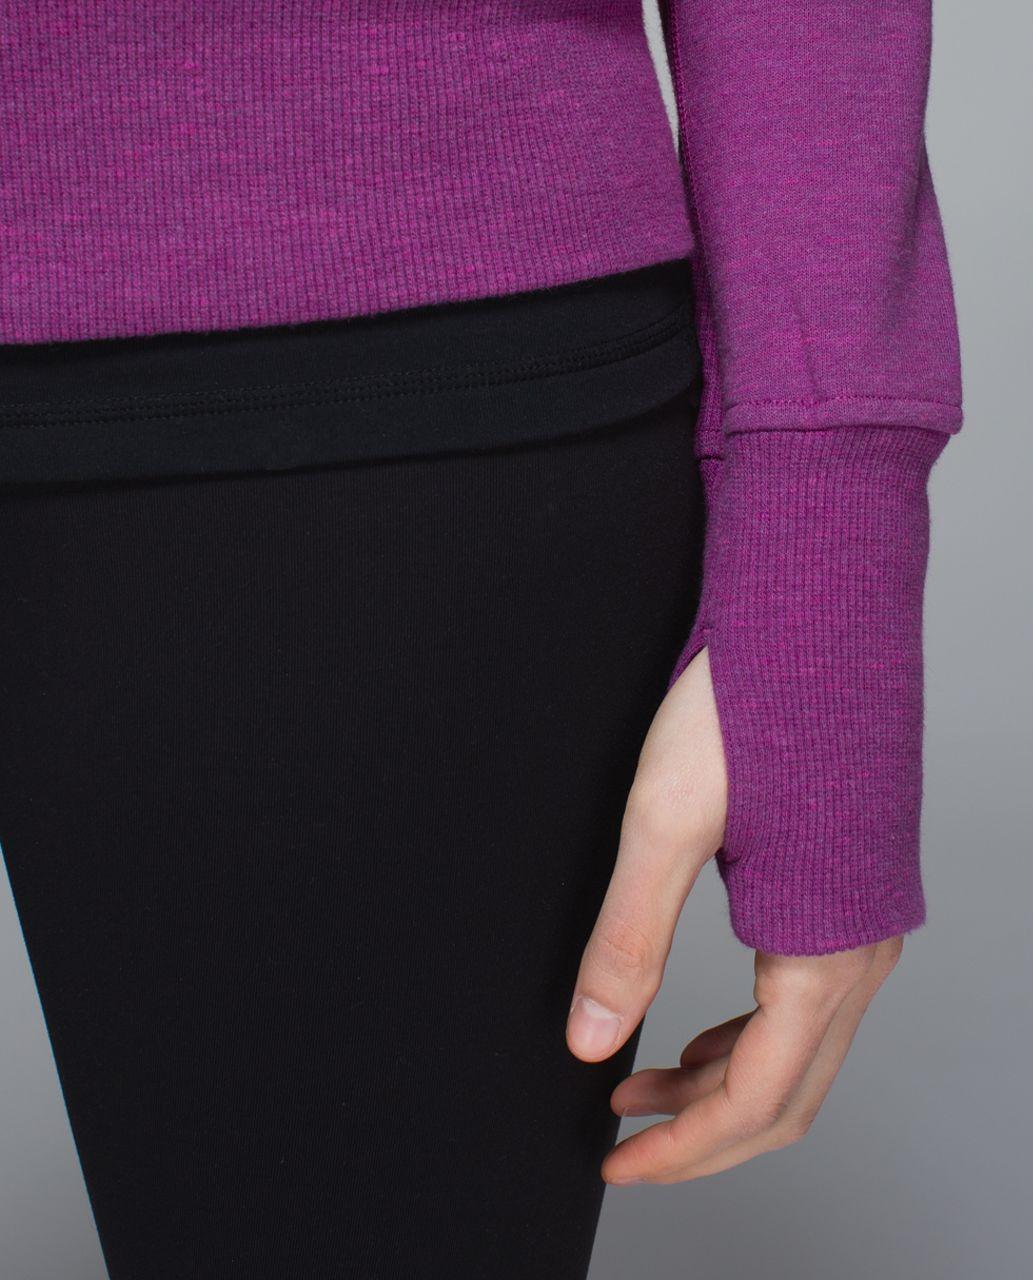 Lululemon Scuba Hoodie II - Heathered Marled Ultra Violet / Ultra Violet